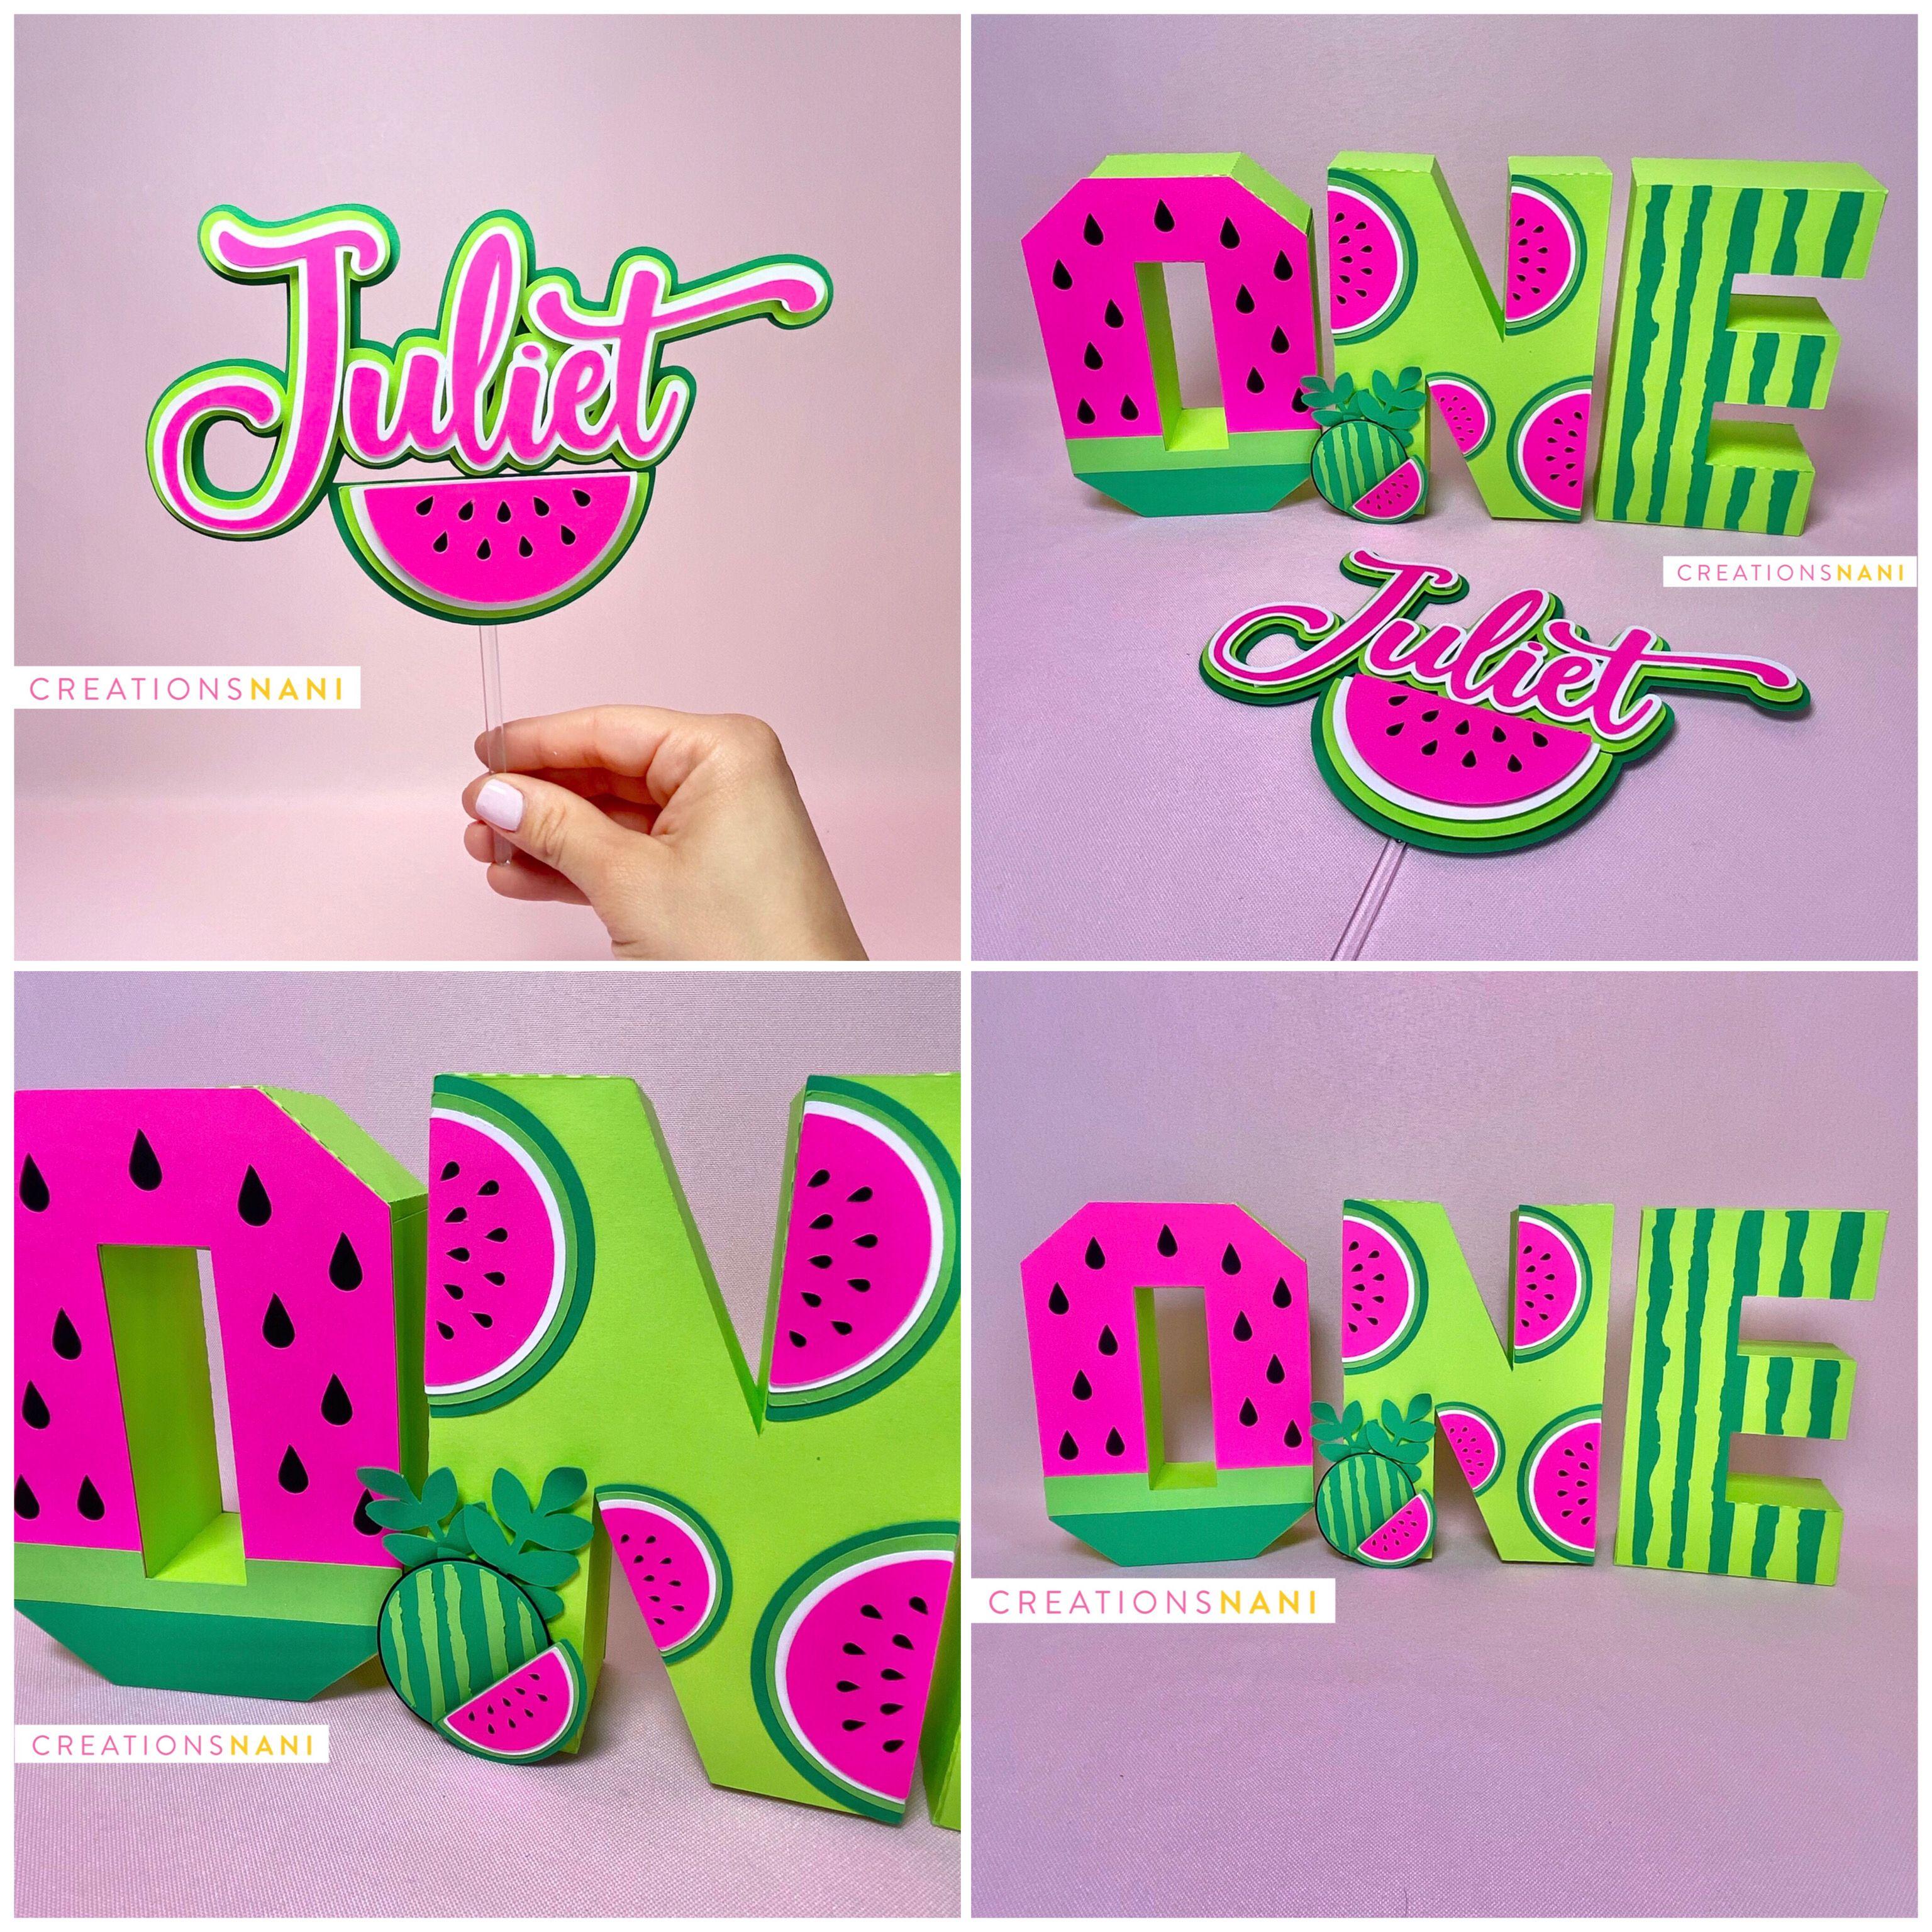 Sandia Halloween Party 2020 Pics Watermelon birthday   3D letter   Sandia cake topper in 2020